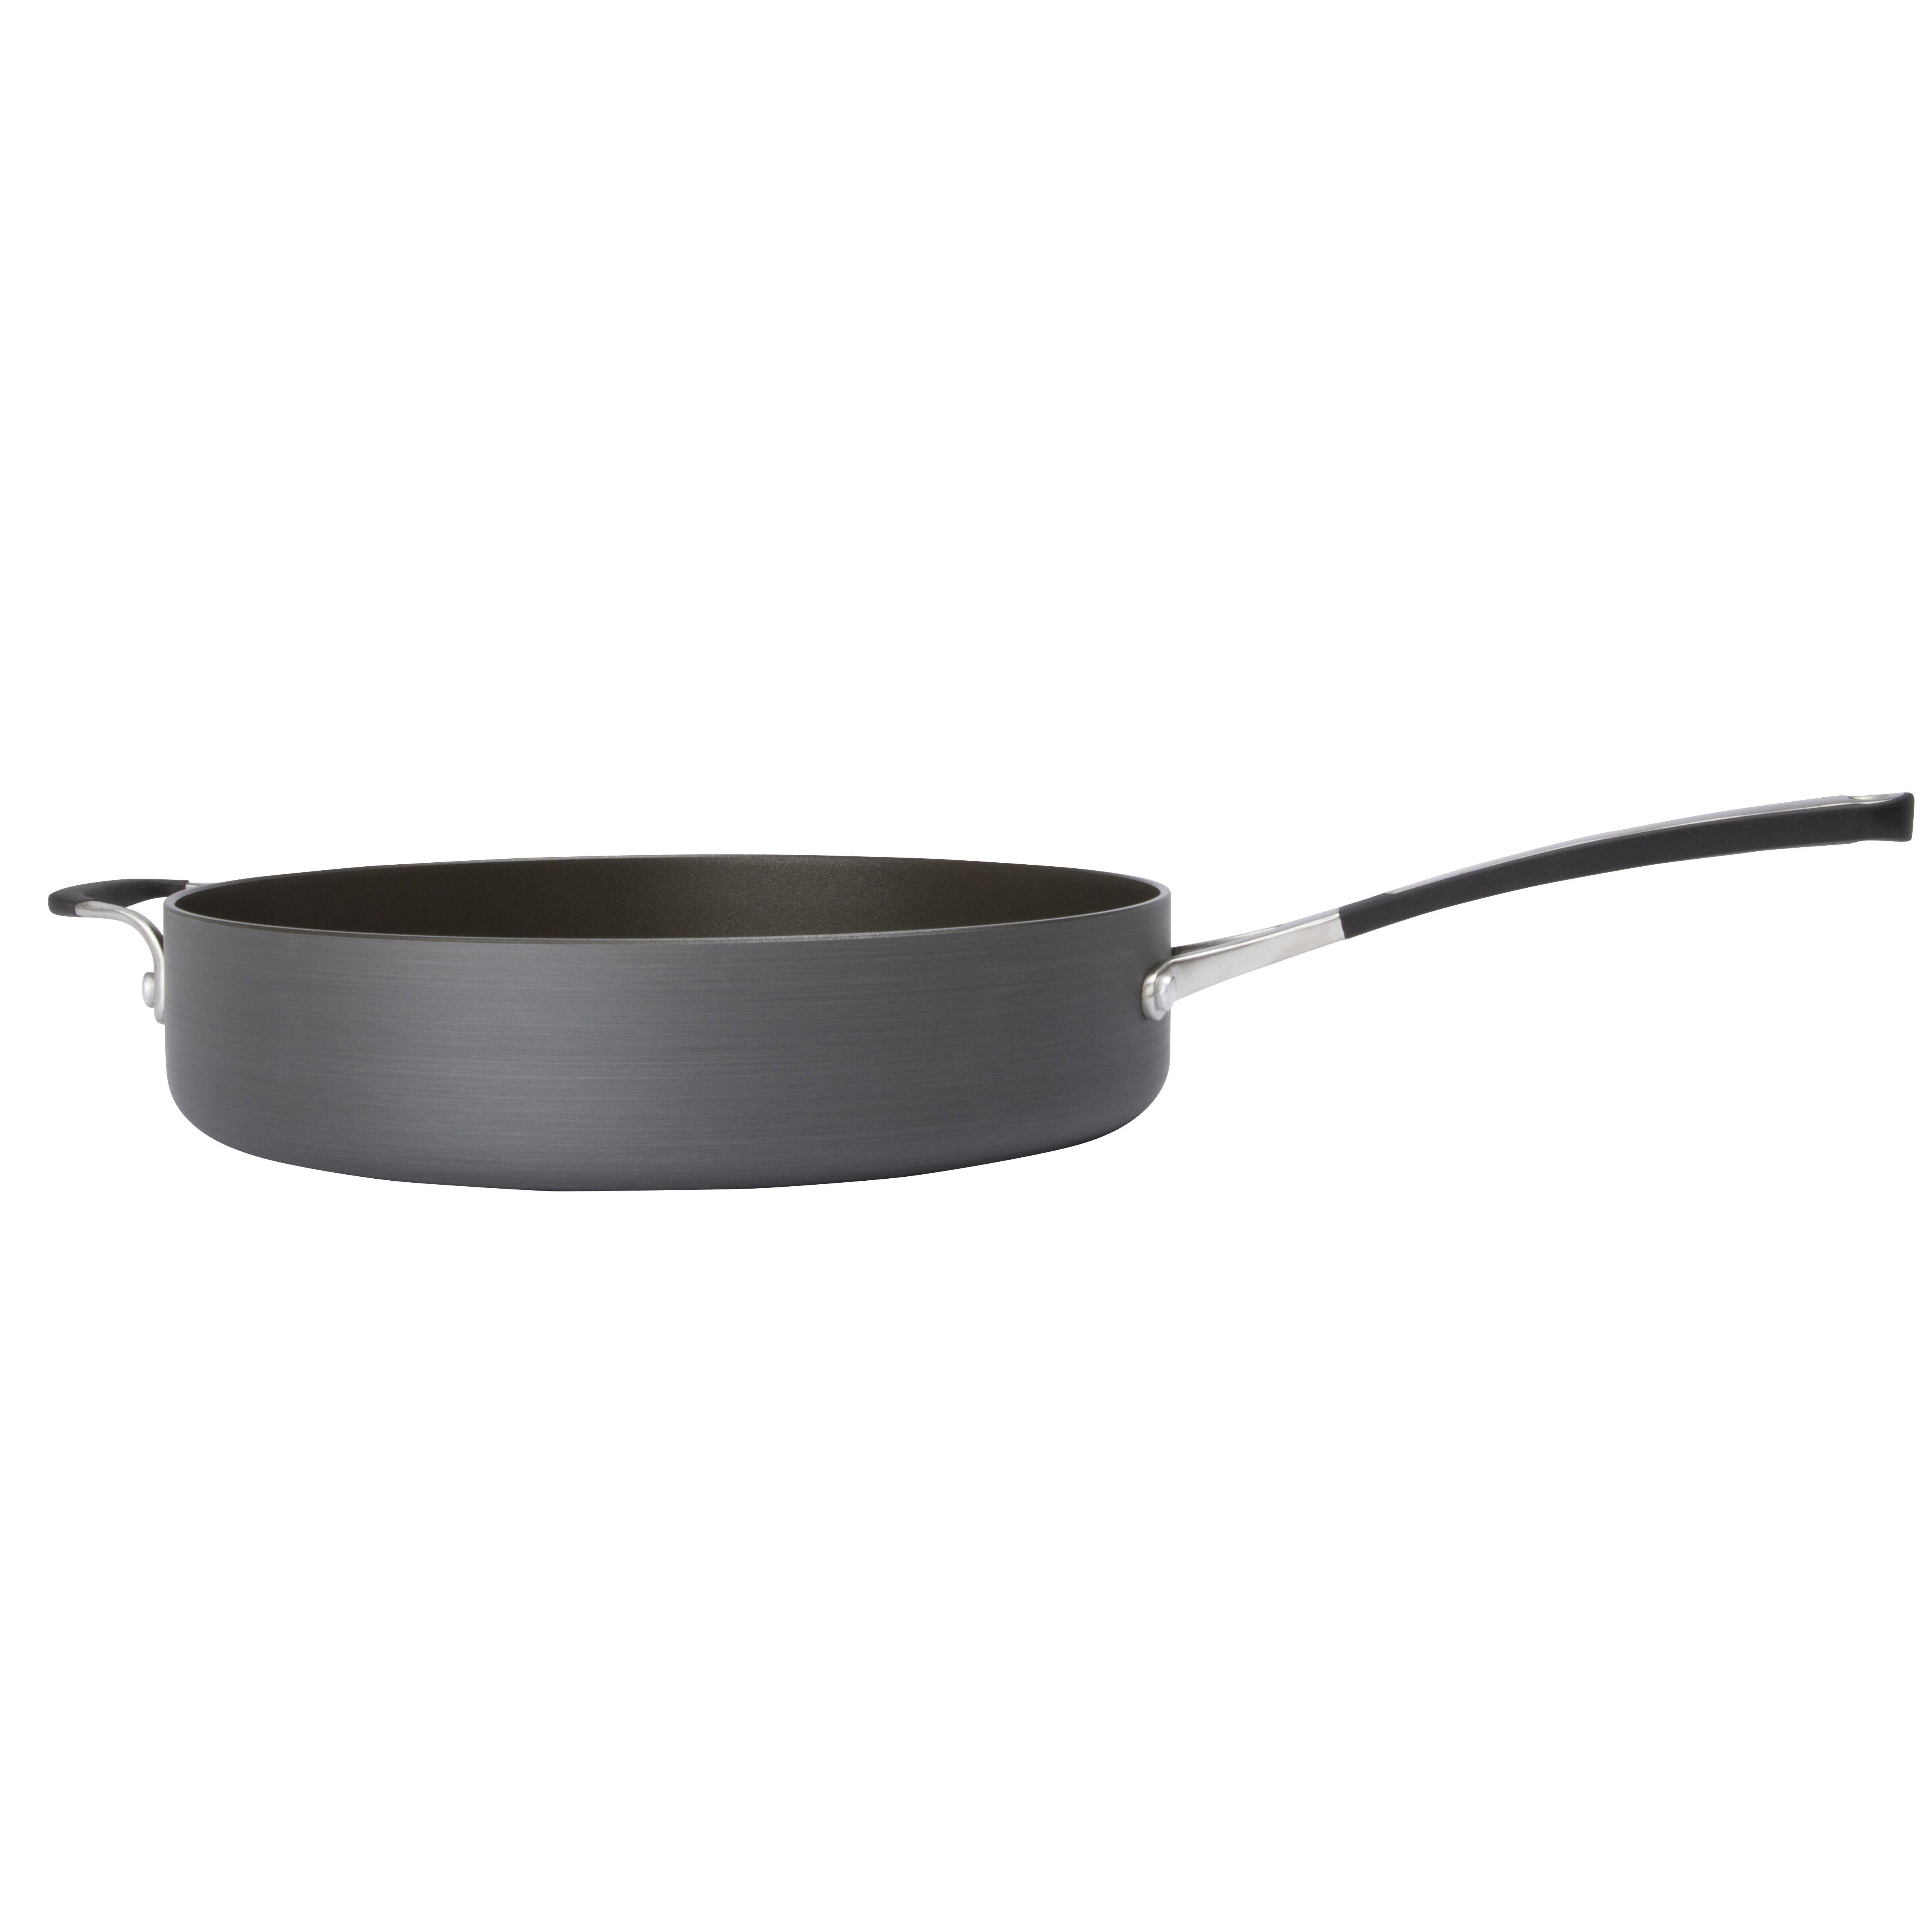 Calphalon Simply Nonstick 5-qt. Saute Pan with Lid ...